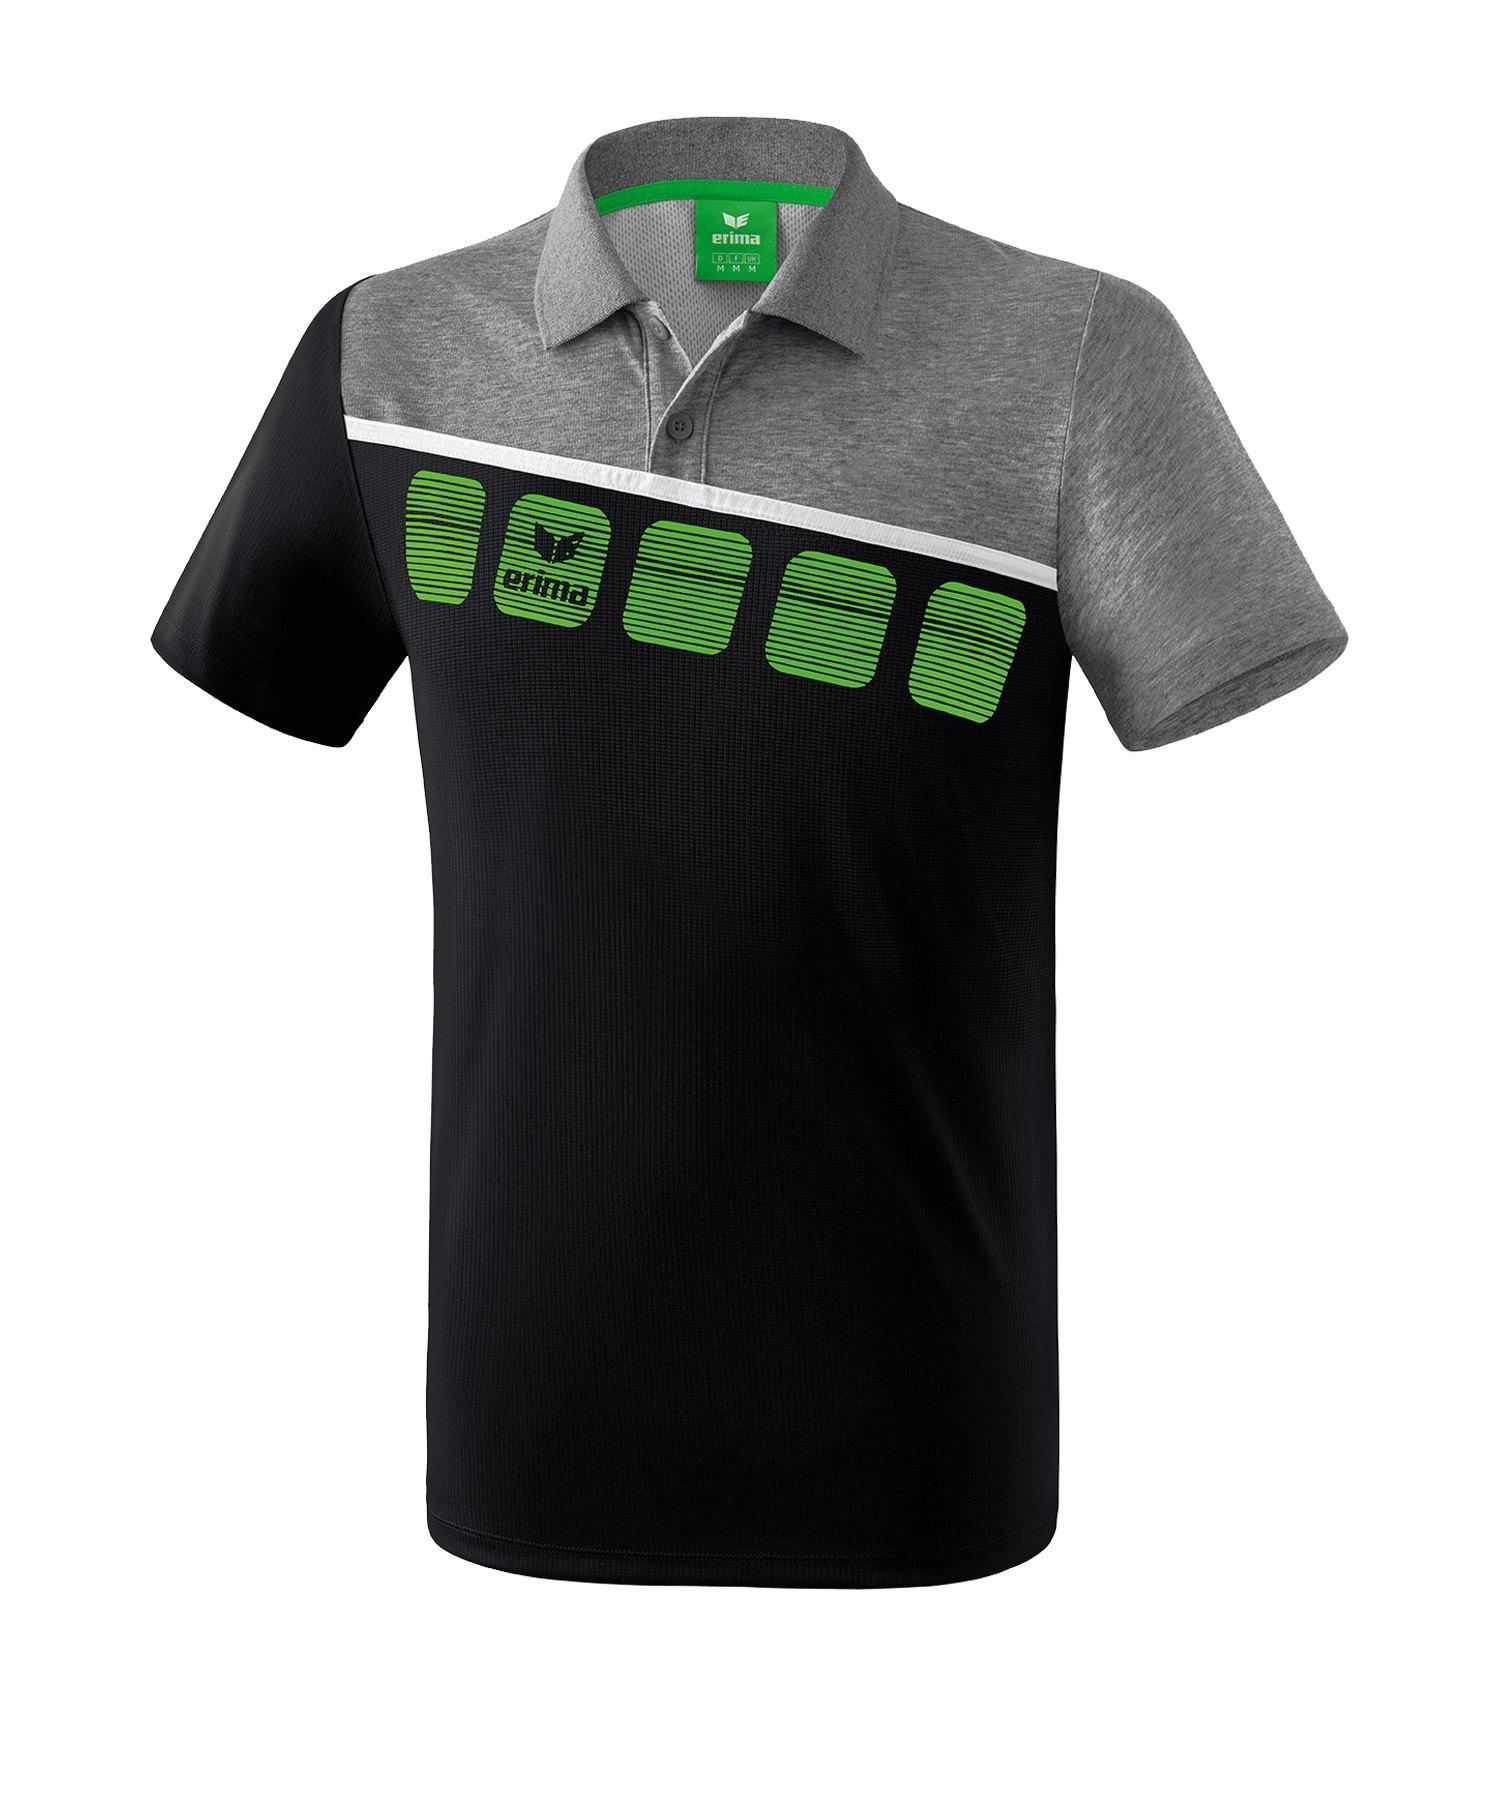 Erima 5-C Poloshirt Kids Schwarz Grau - Schwarz